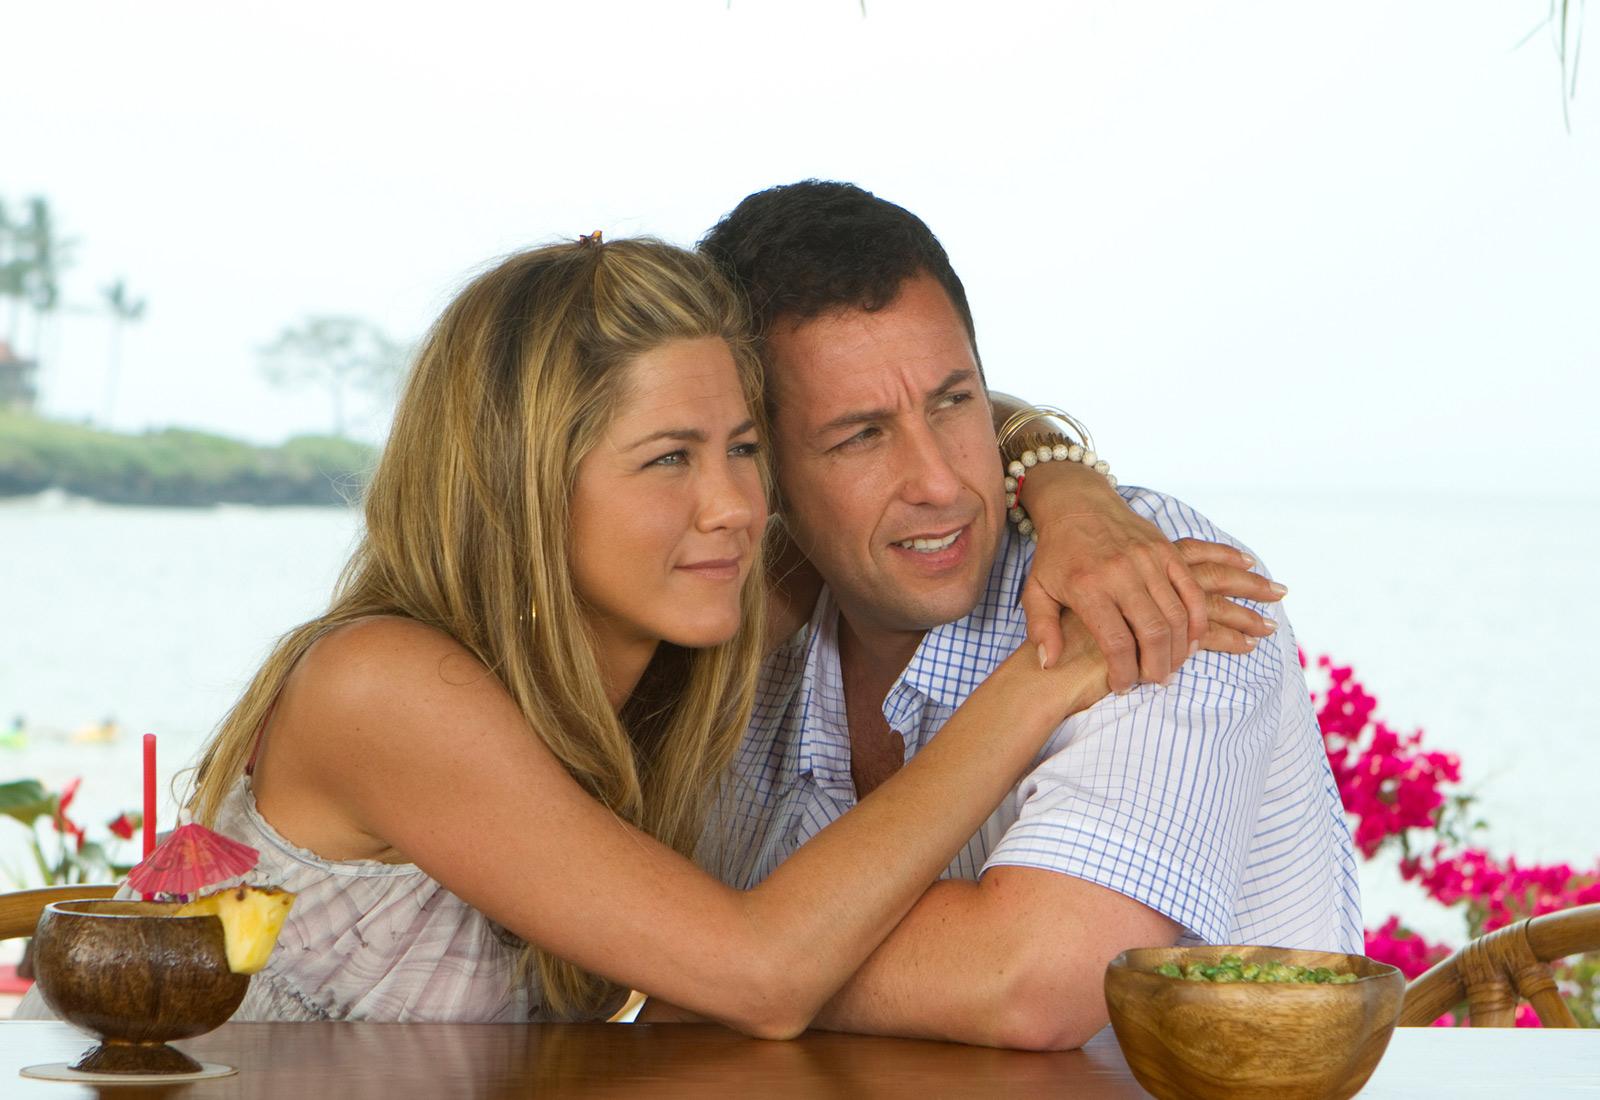 Jennifer Aniston and Brooklyn Decker Photos Photos